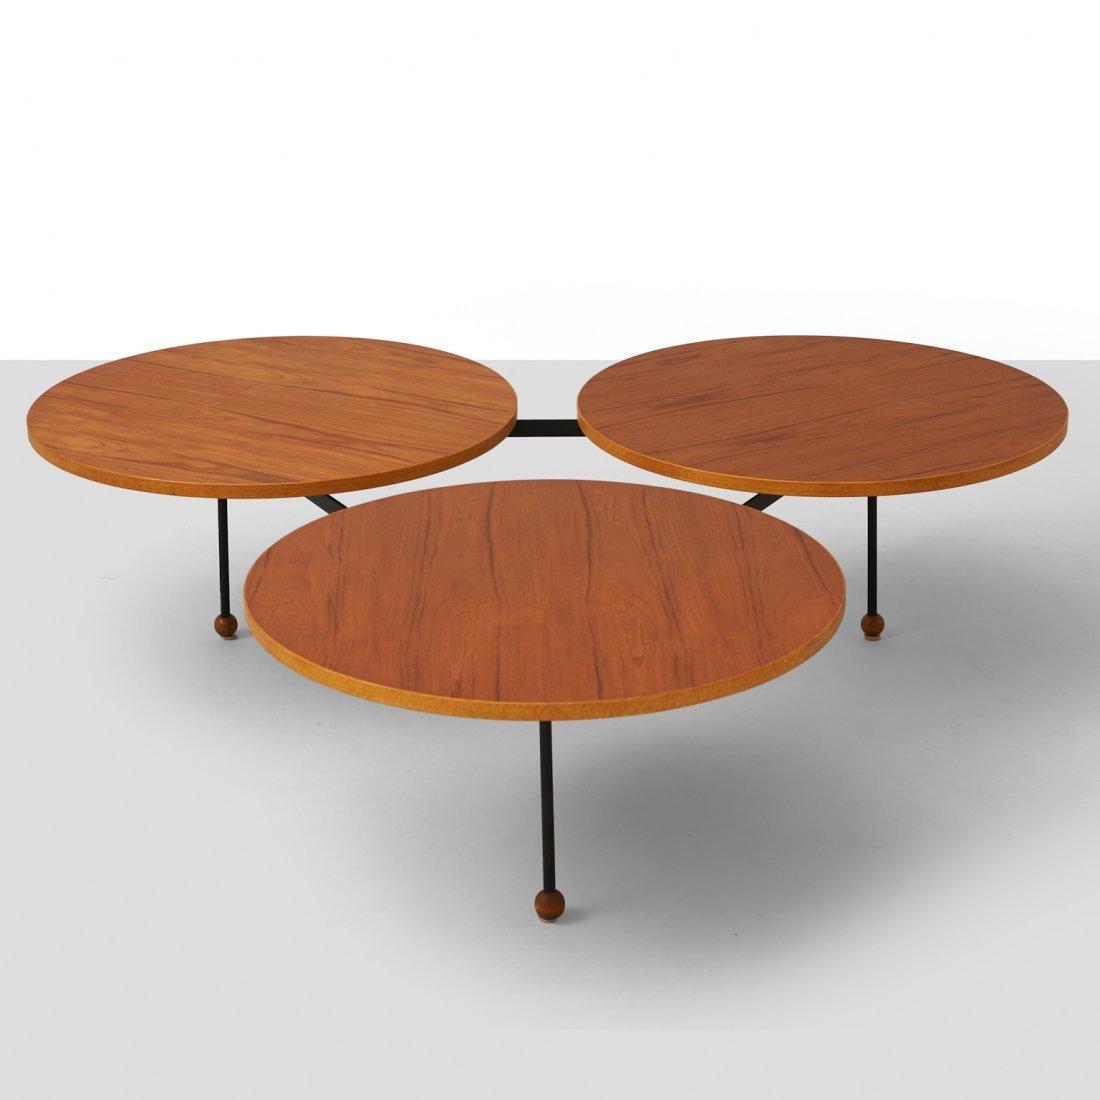 Greta Grossman, Flying Saucer Coffee Table